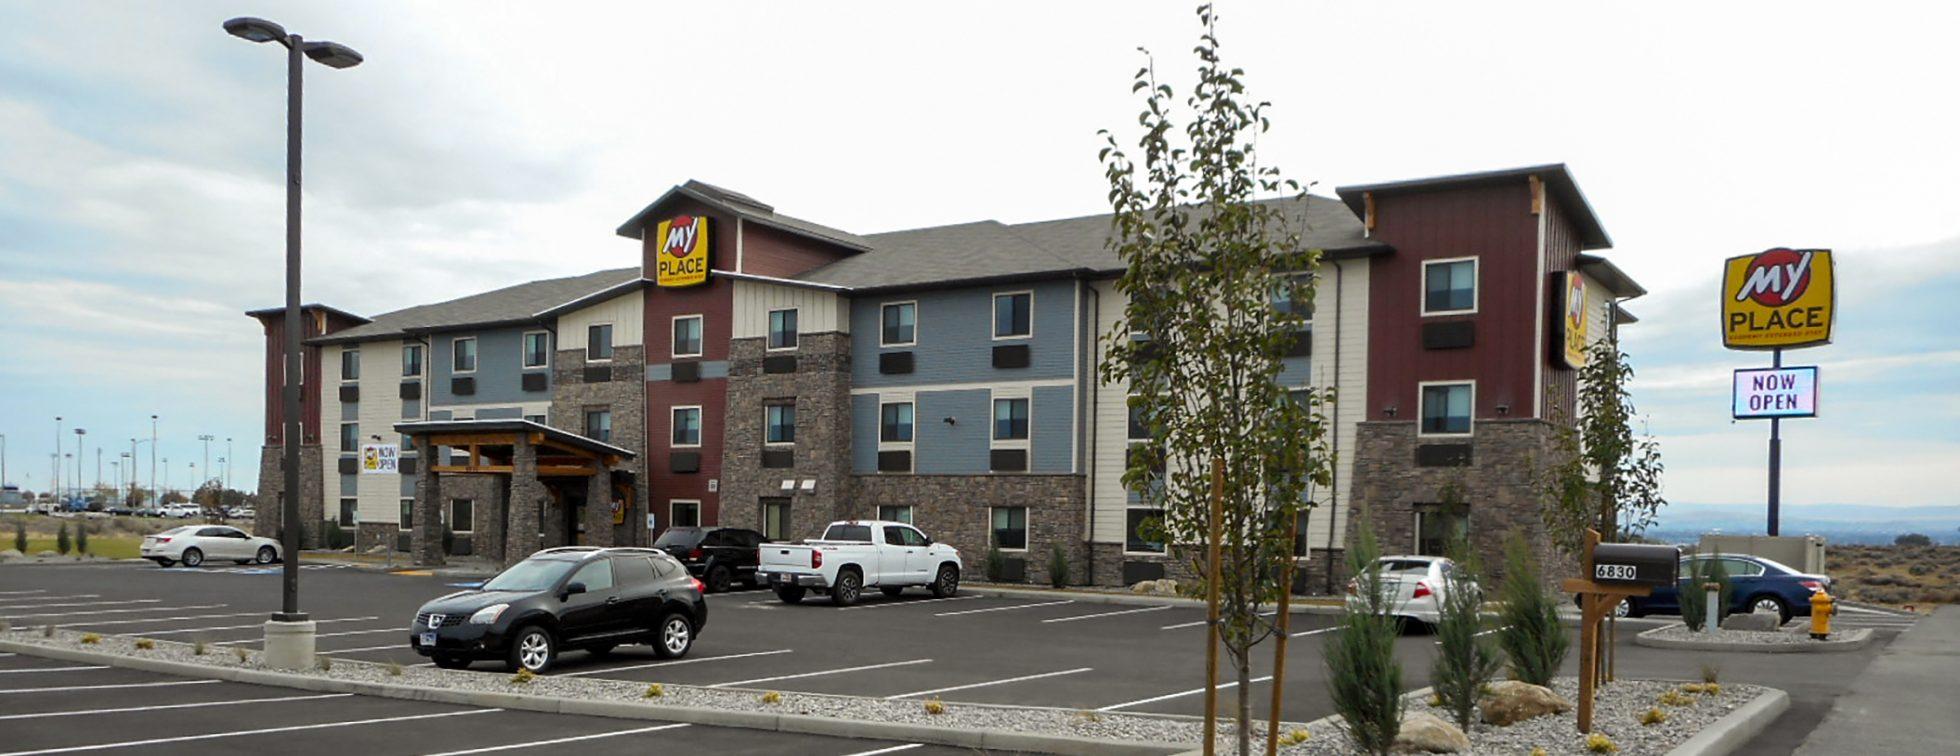 Hotel In Spokane Valley My Place Hotels